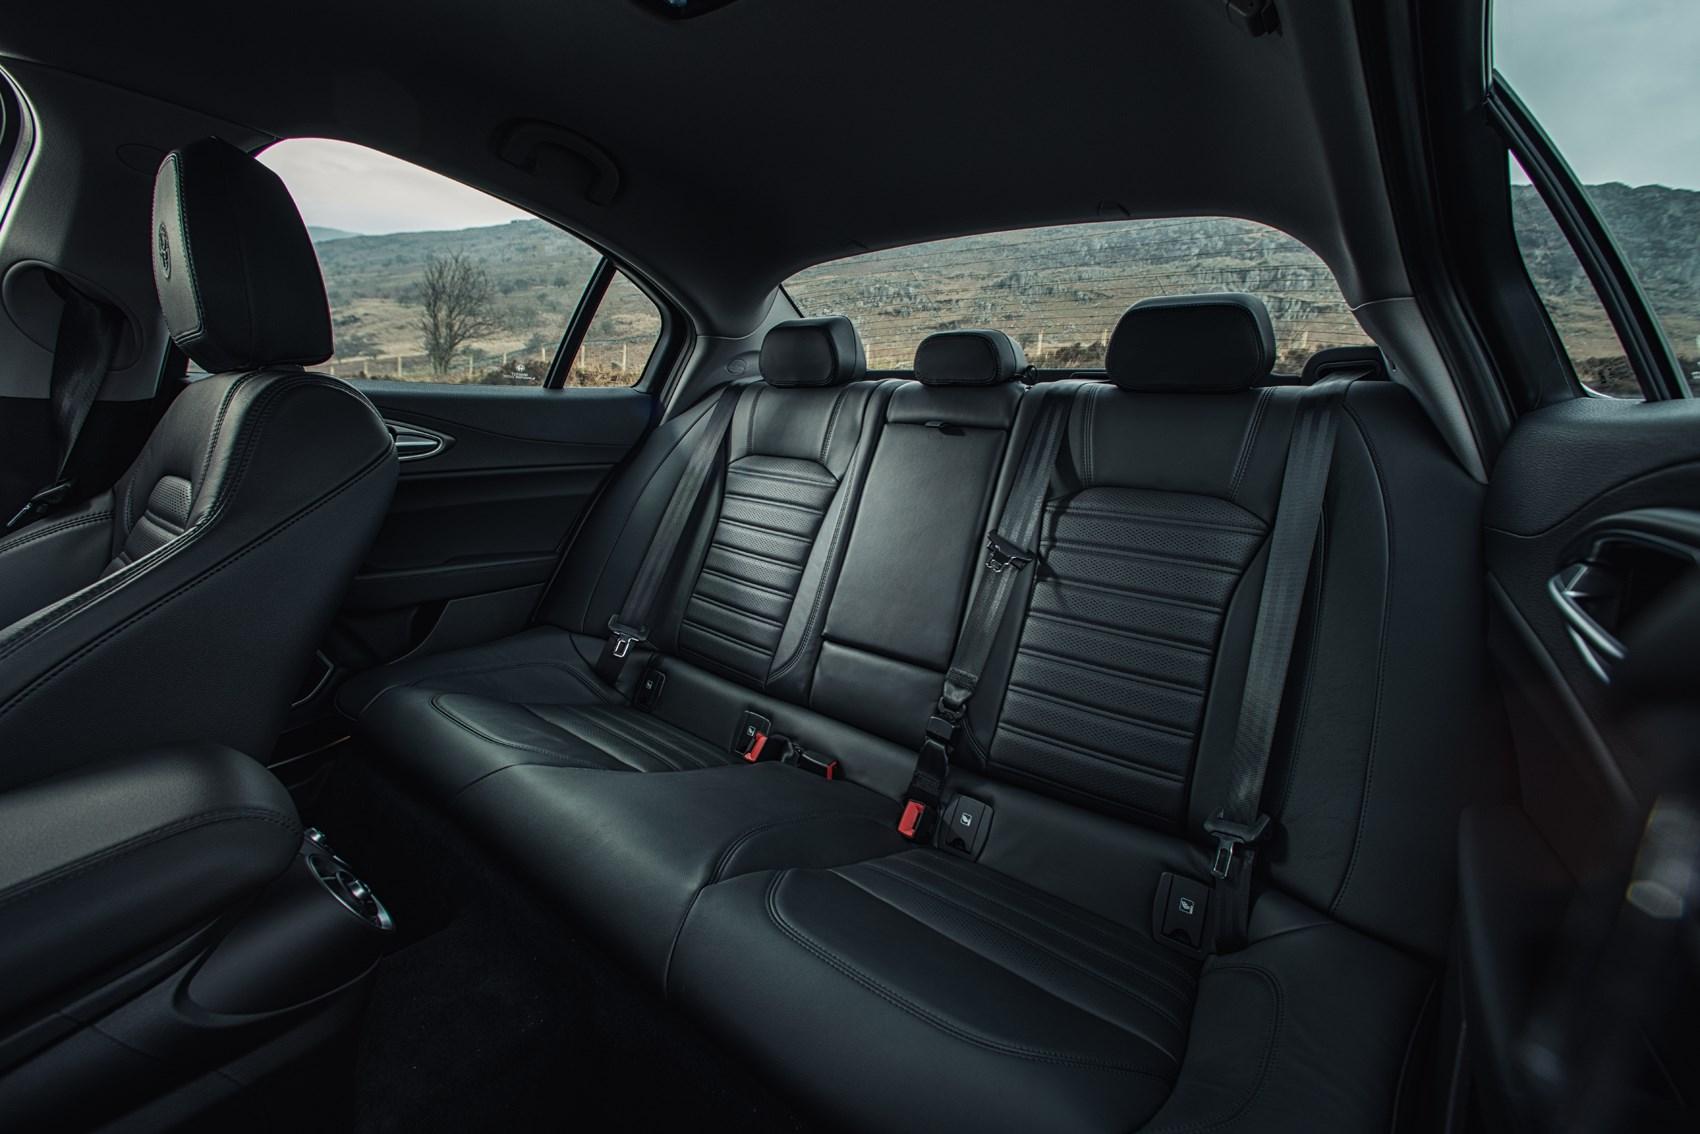 Alfa Romeo Giulia Interior >> Alfa Romeo Giulia 2019 Interior Layout Dashboard